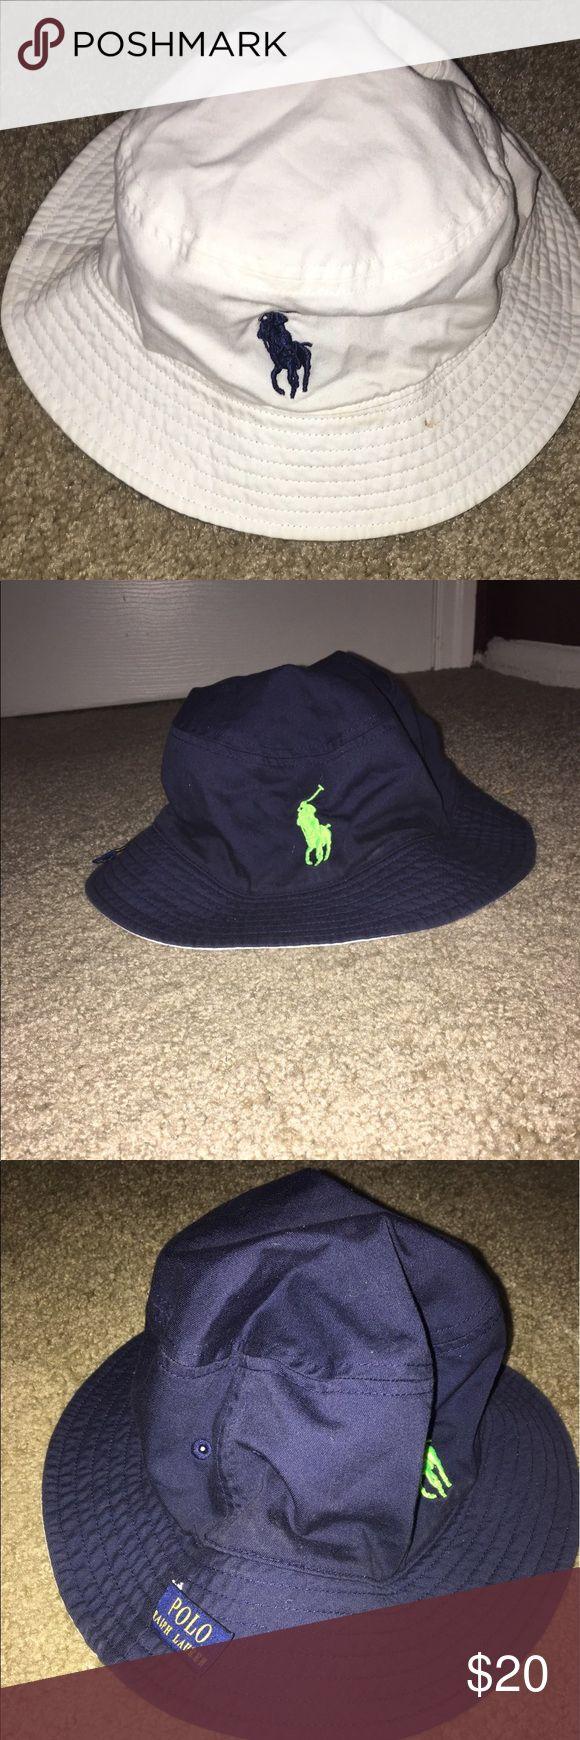 2 sided Authentic Ralph Lauren Bucket Hat One size, makeup mark Polo by Ralph Lauren Accessories Hats